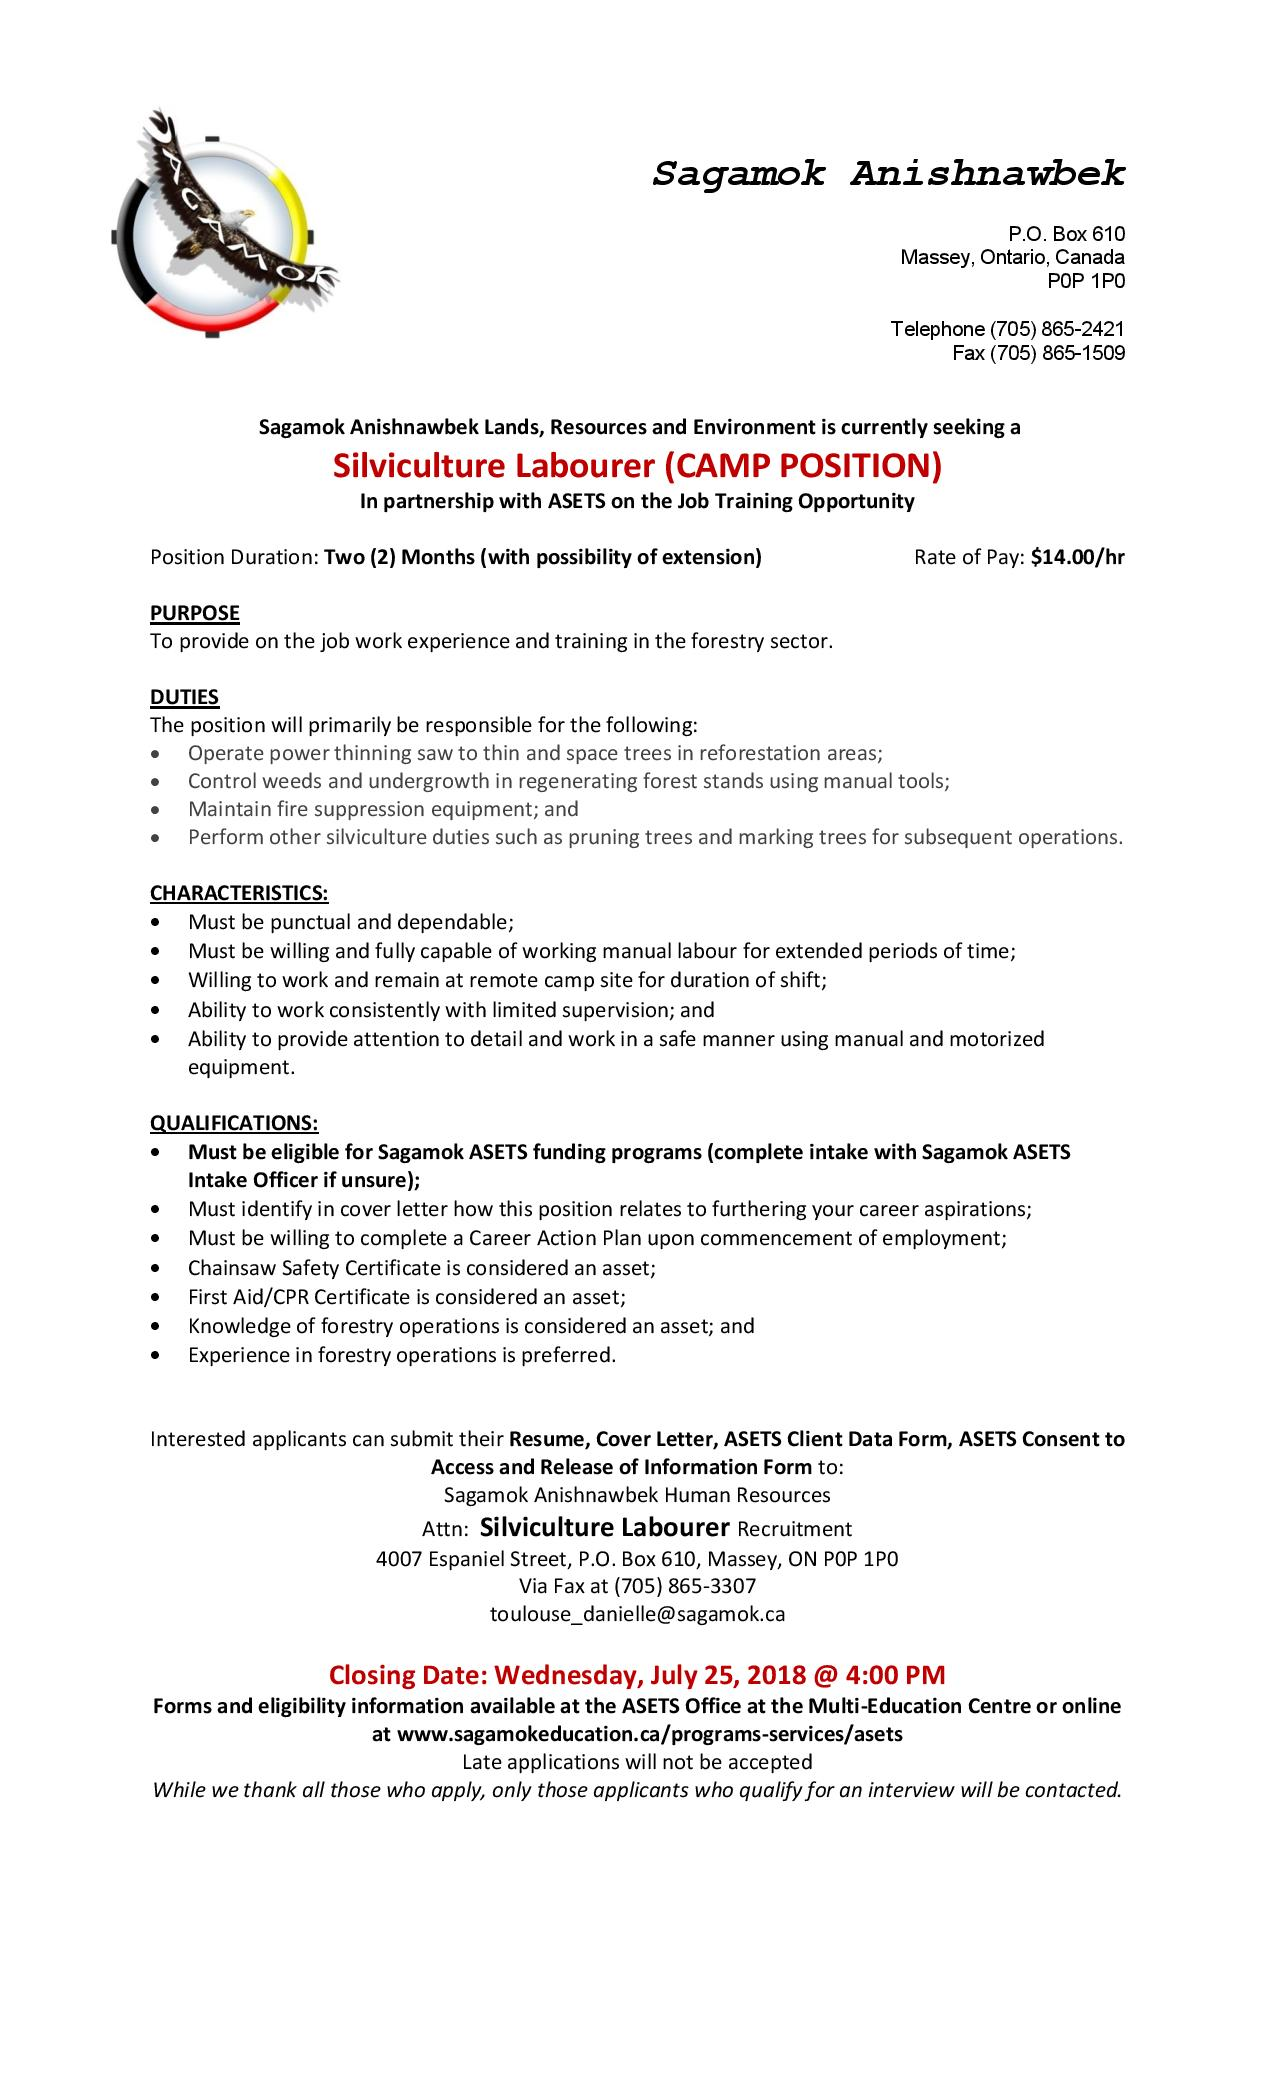 LRE Brushing Job Posting-Labourer-page-001.jpg